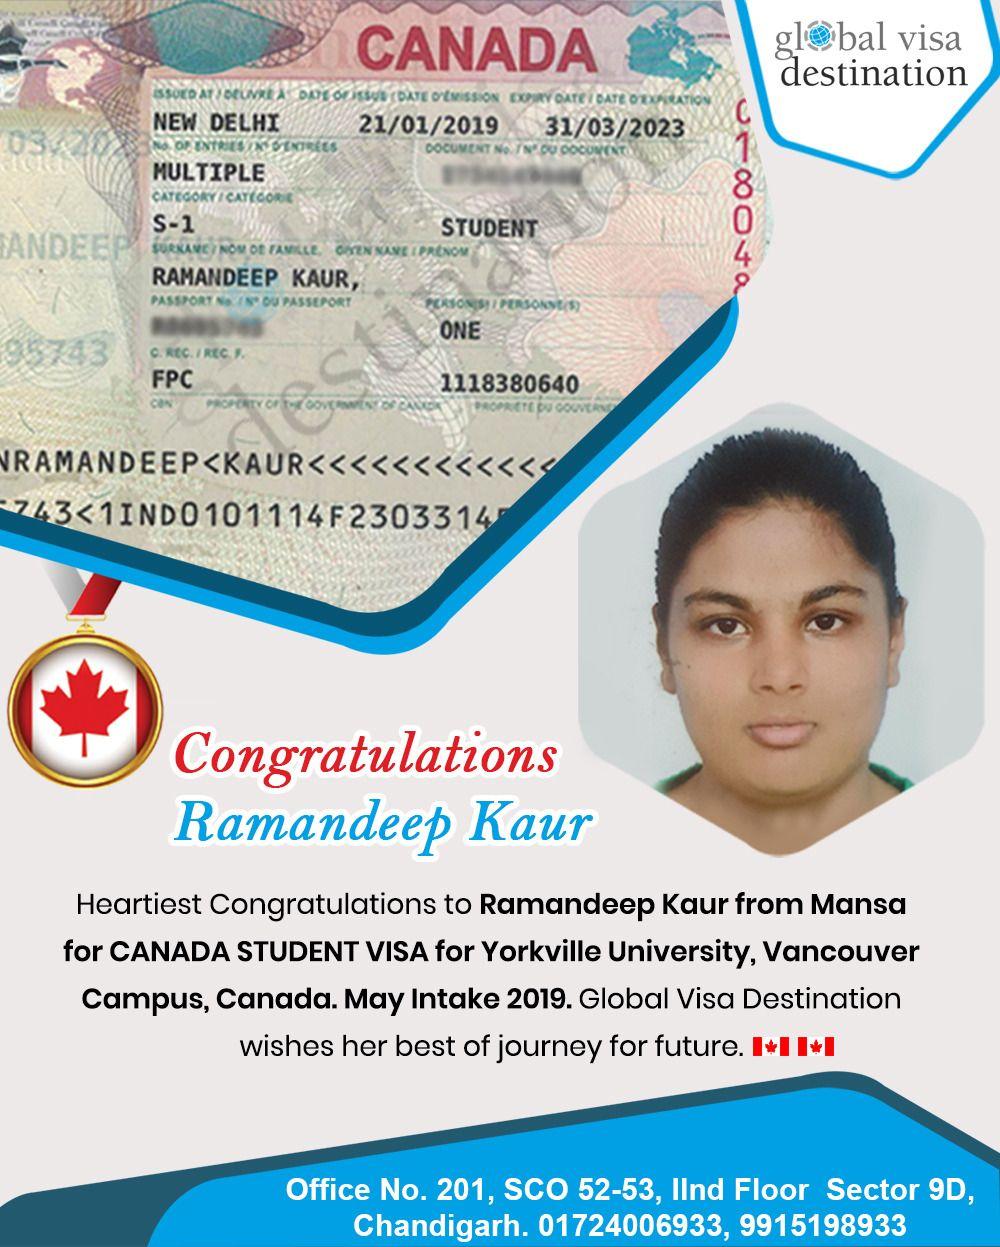 Yet Another Accolade Congrats To Ramandeep Kaur For Canada